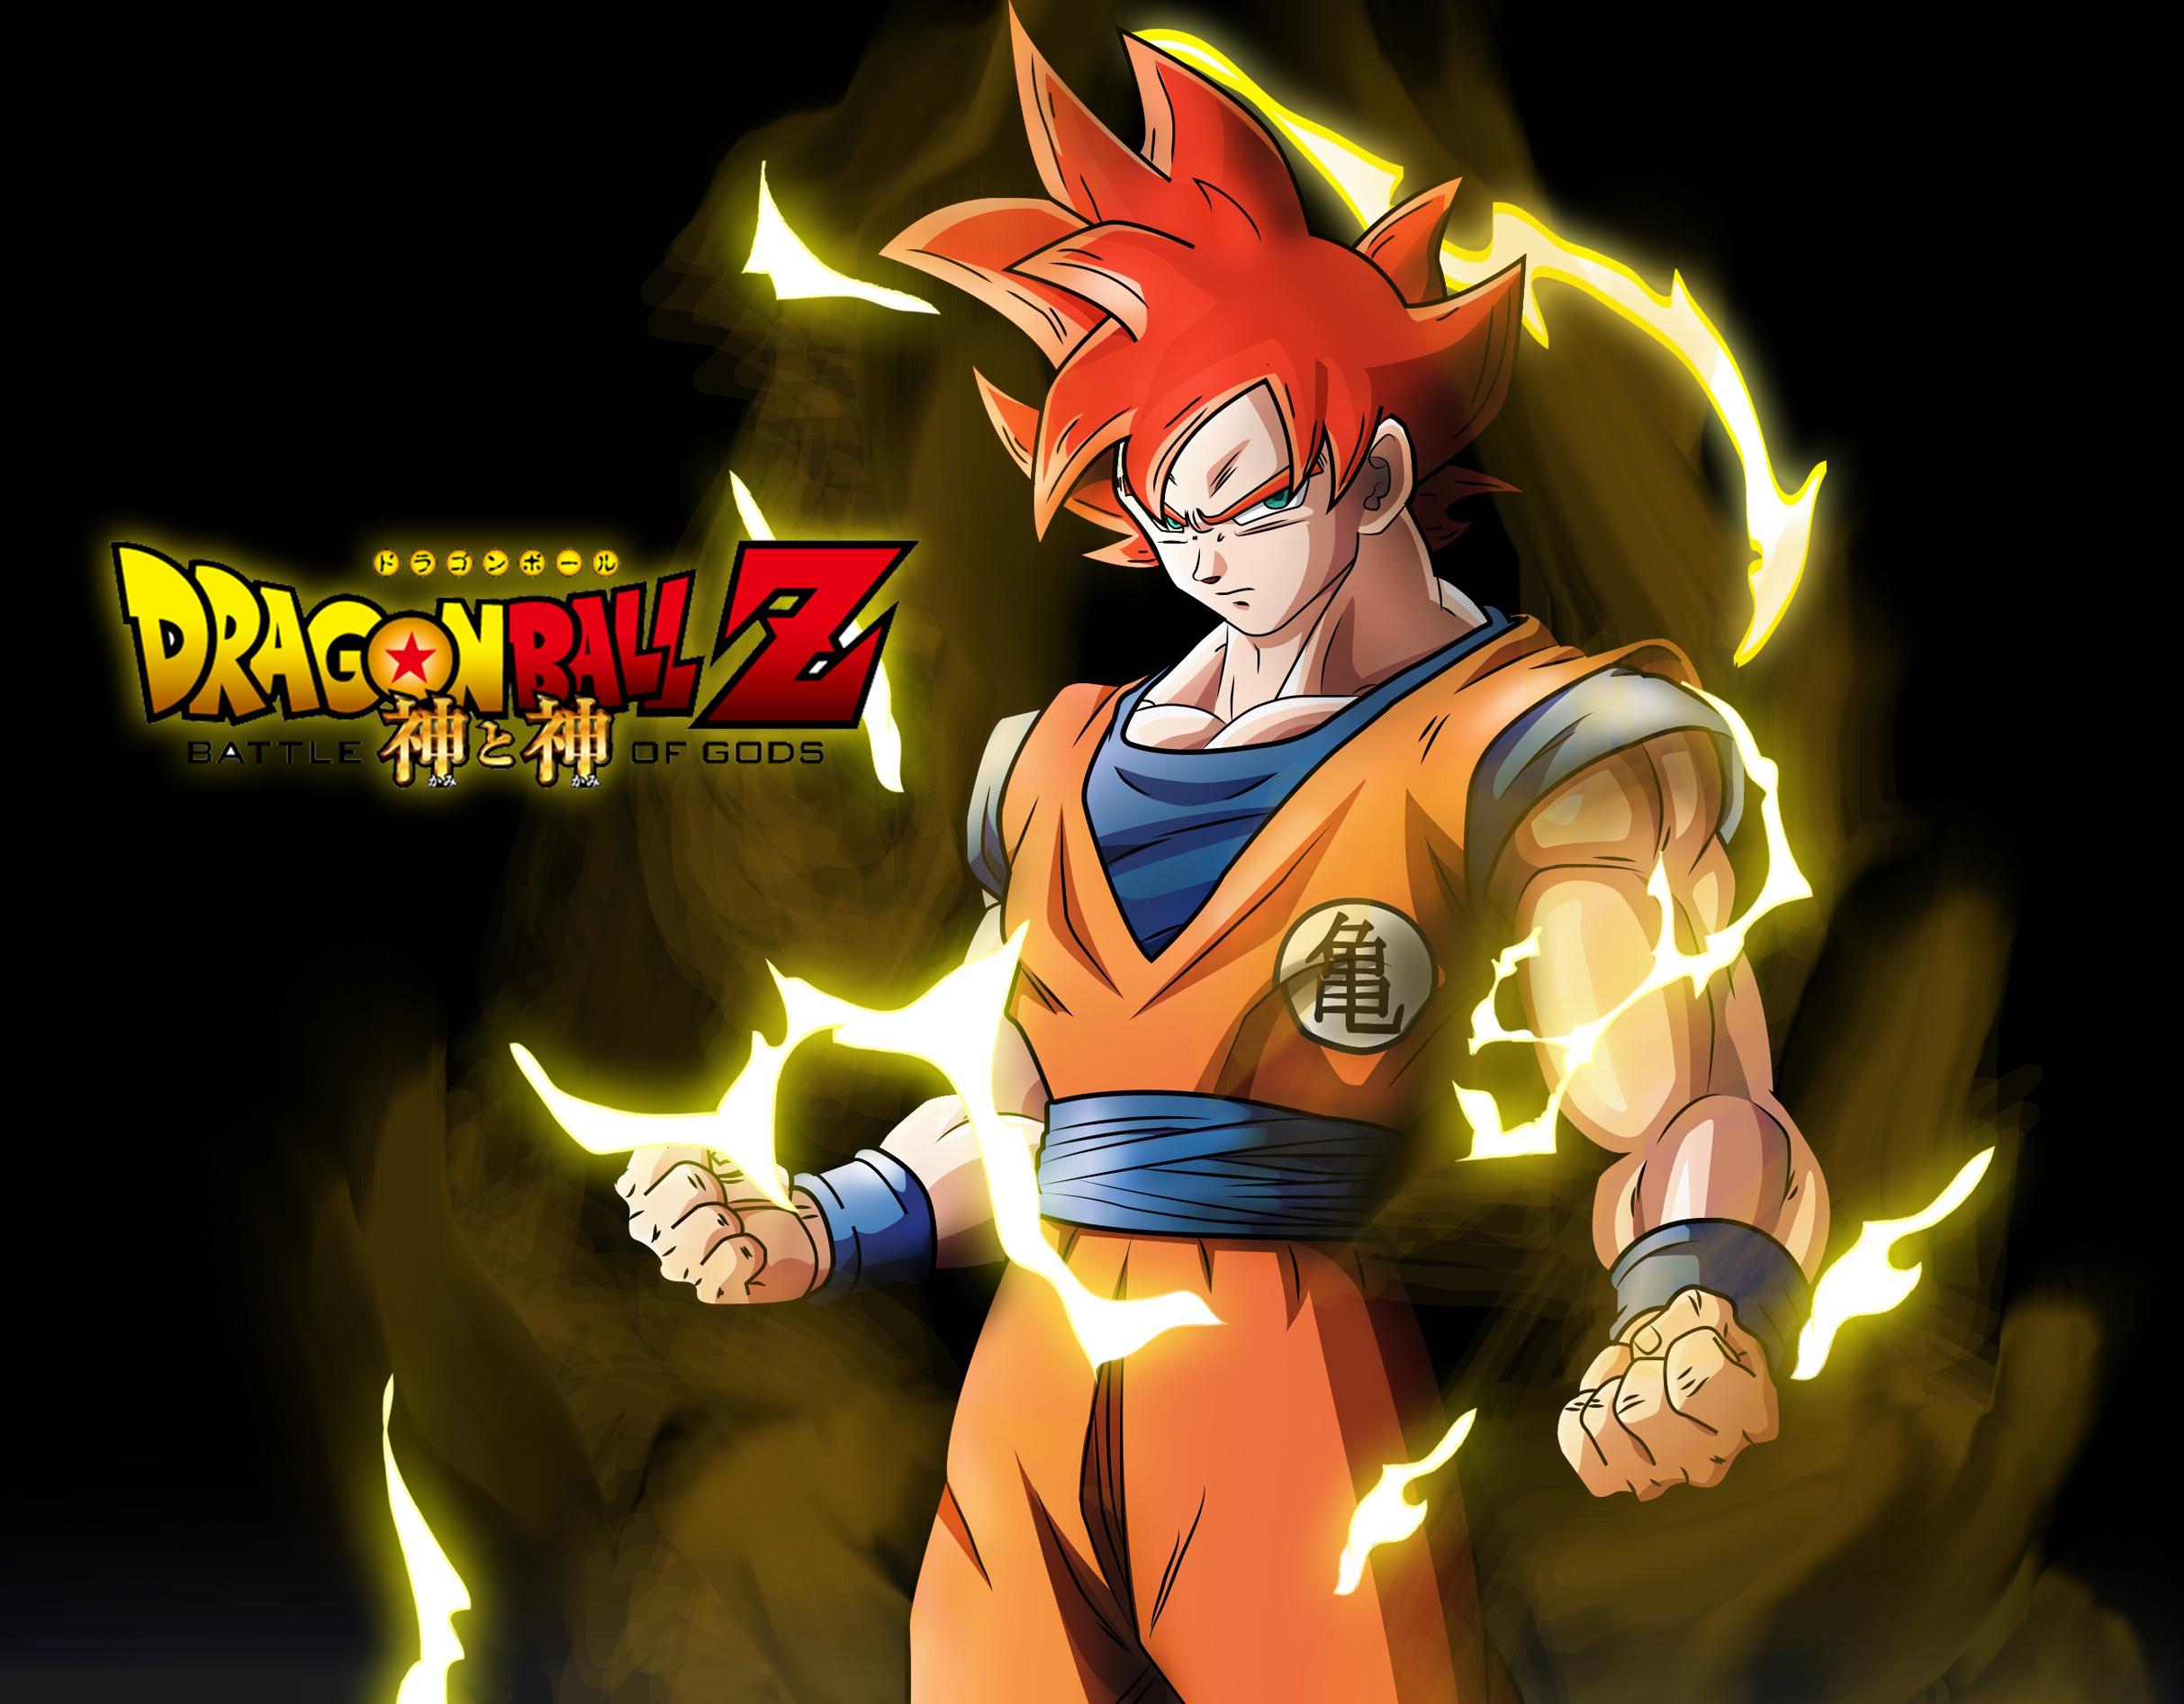 Goku SSj god HD Wallpaper Background Image 2426x1893 ID 2426x1893